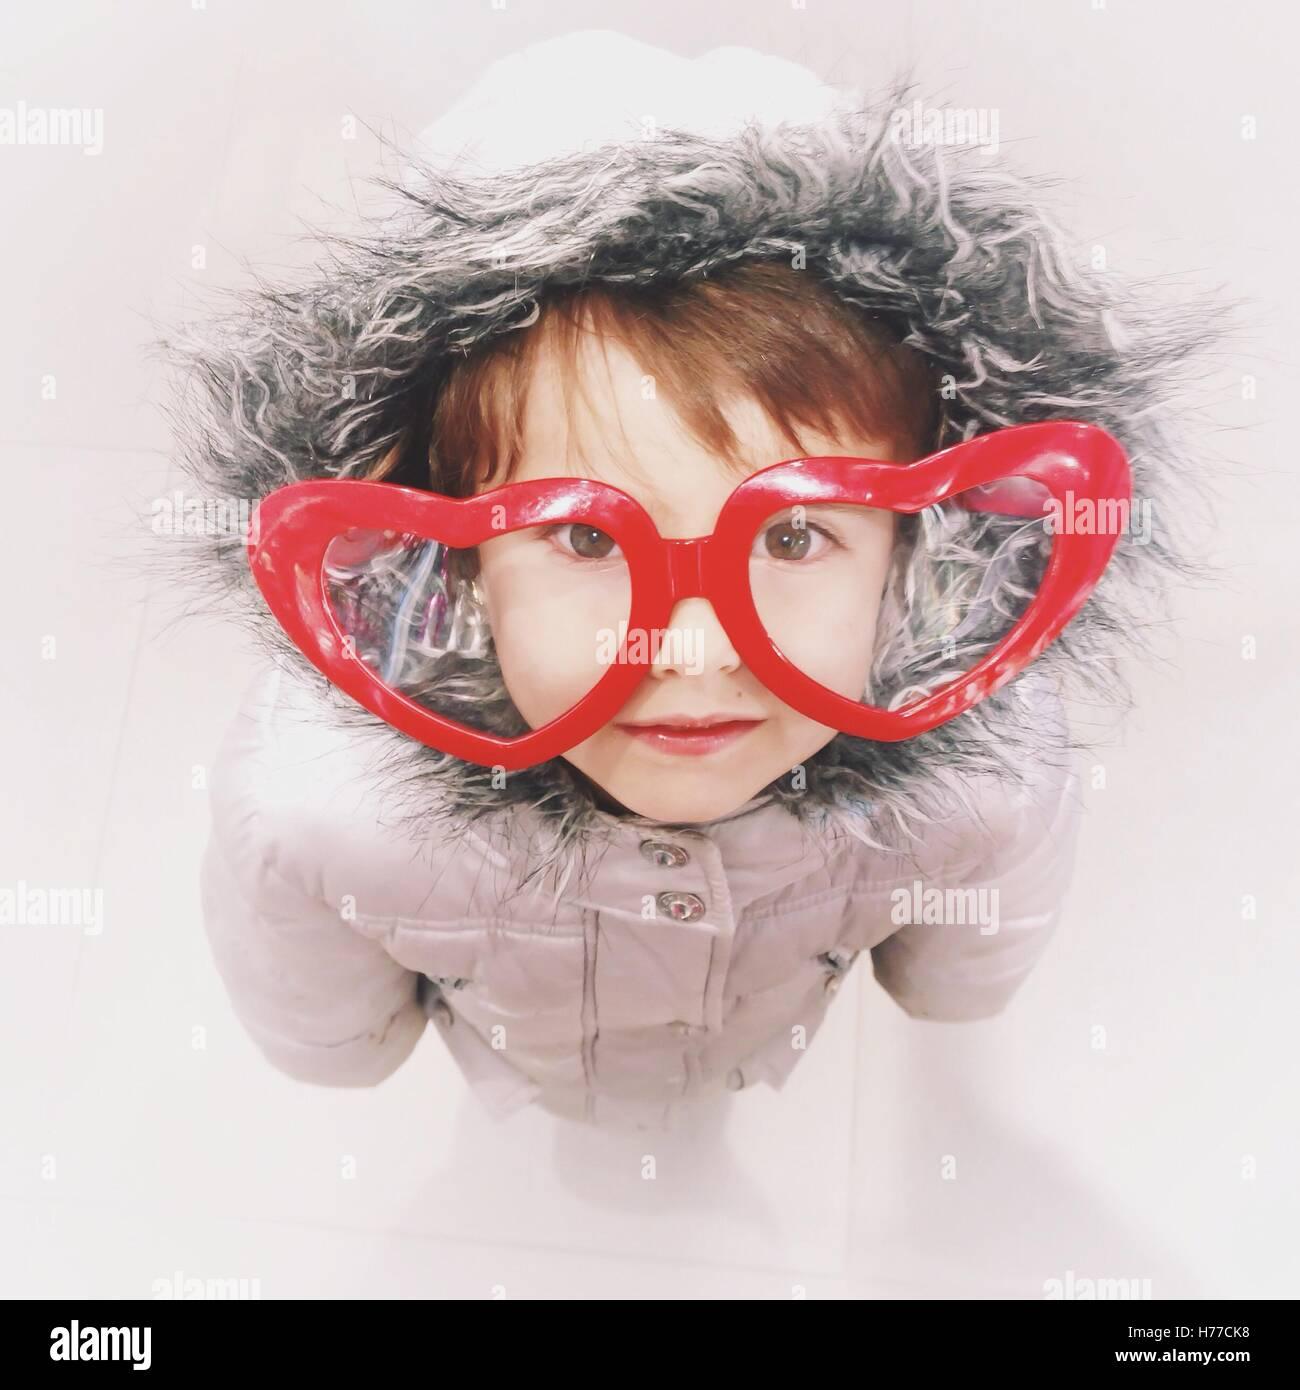 Girl in a warm coat wearing heart shape glasses Stock Photo